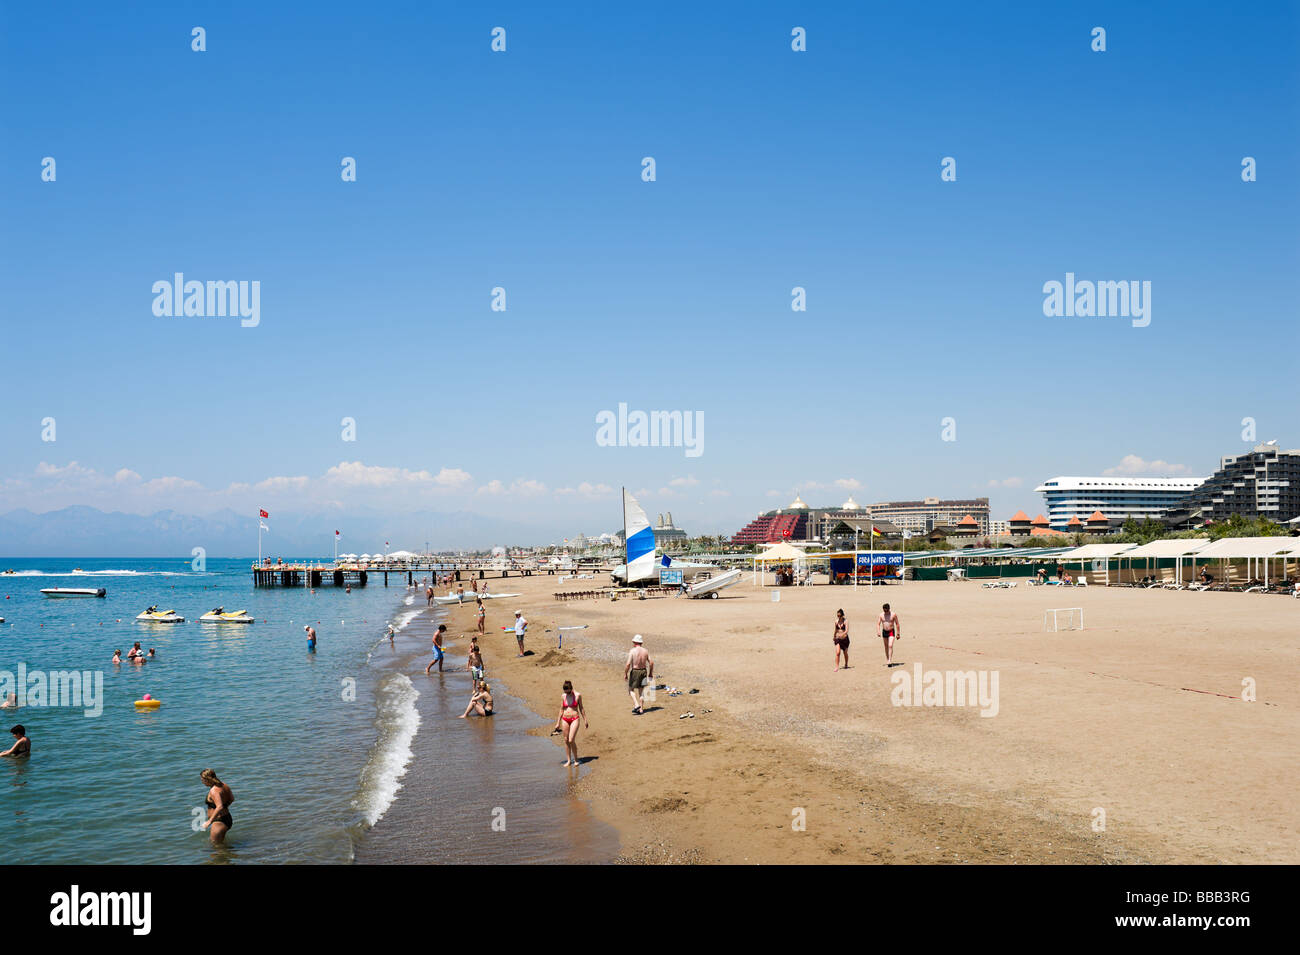 Beach outside the Royal Wings Hotel, Lara Beach, near Antalya, Mediterranean Coast, Turkey - Stock Image